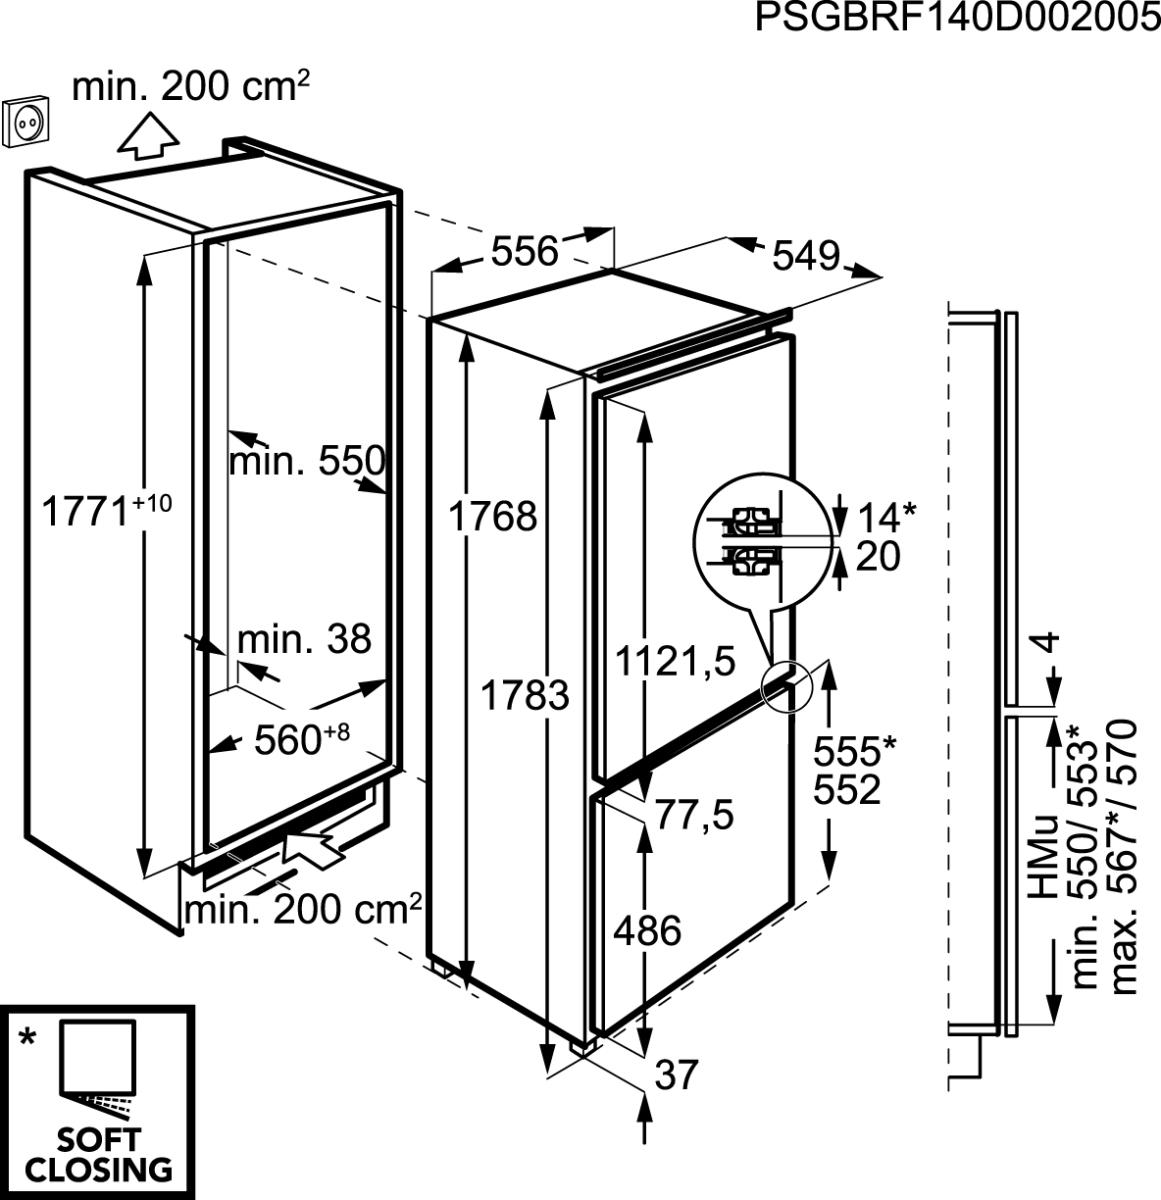 aeg sce81826zc einbau k hl gefrierkombination 178cm festt r technik 0 grad zone a led. Black Bedroom Furniture Sets. Home Design Ideas